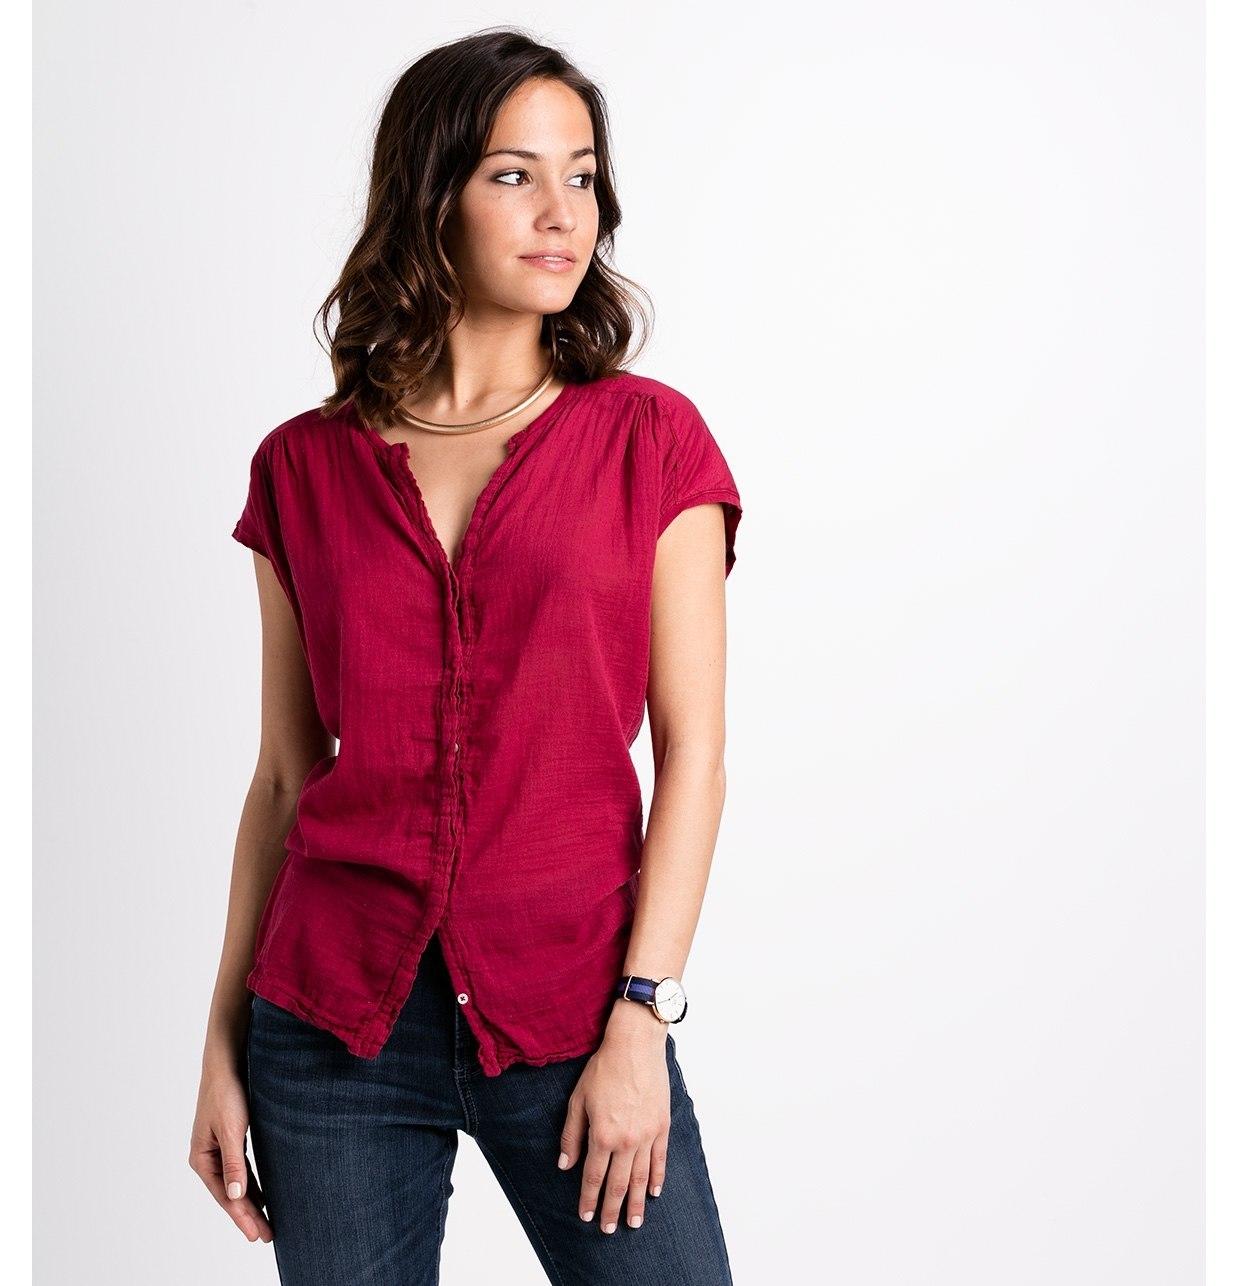 Blusa manga corta modelo TIMOR Doble tela color fresa, 100% algodón